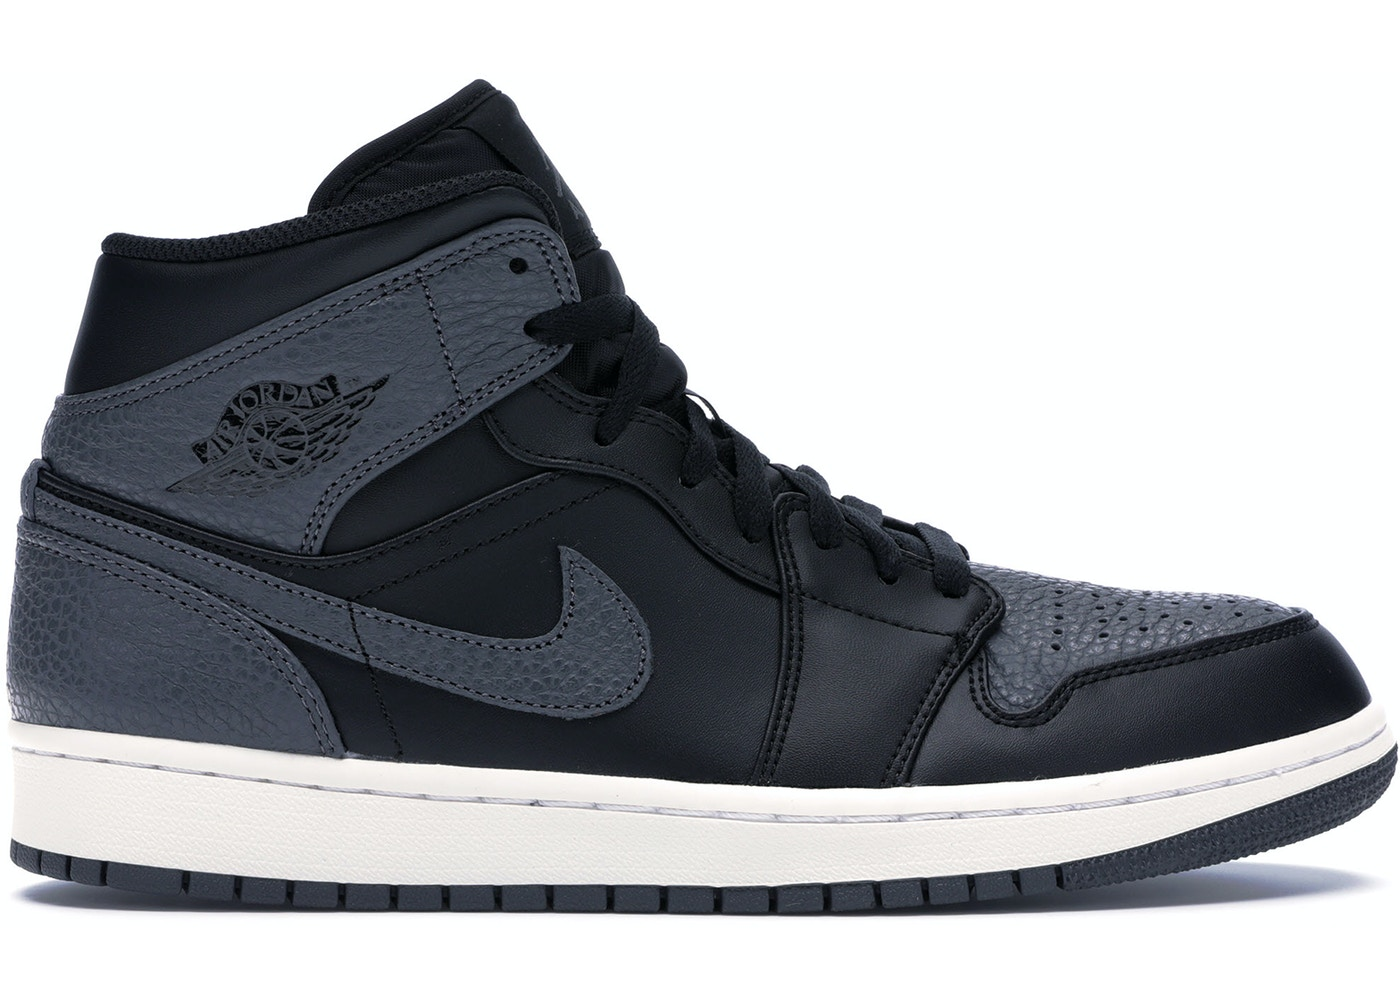 Jordan 1 Retro Mid Black Dark Grey - 554724-041 a16335274